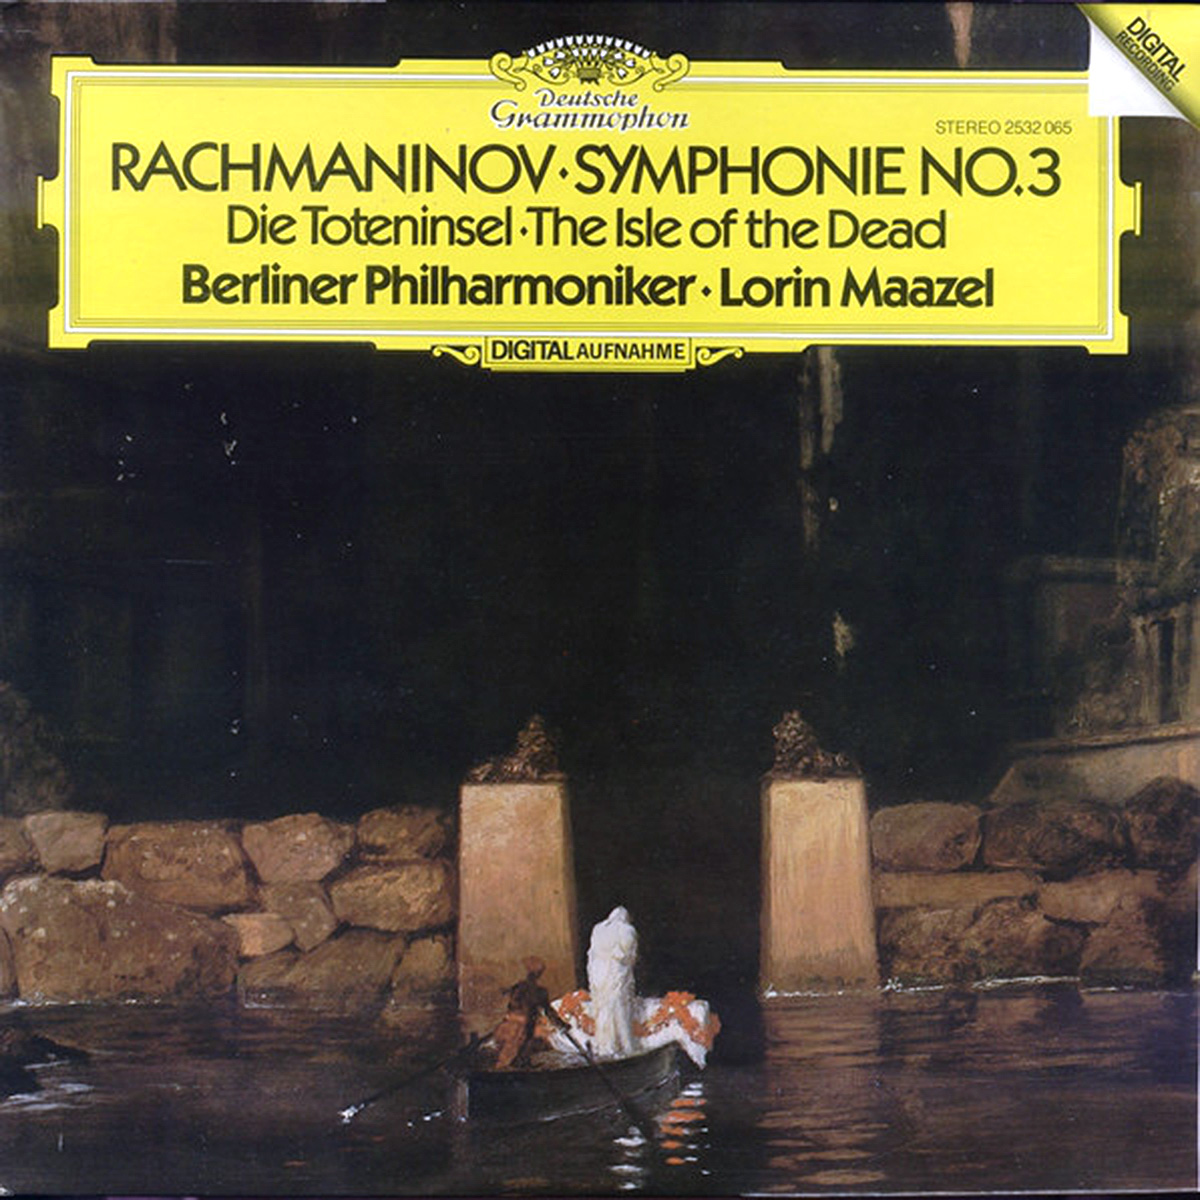 DGG 2532065 Rachmaninov Symphonie 3 Maazel